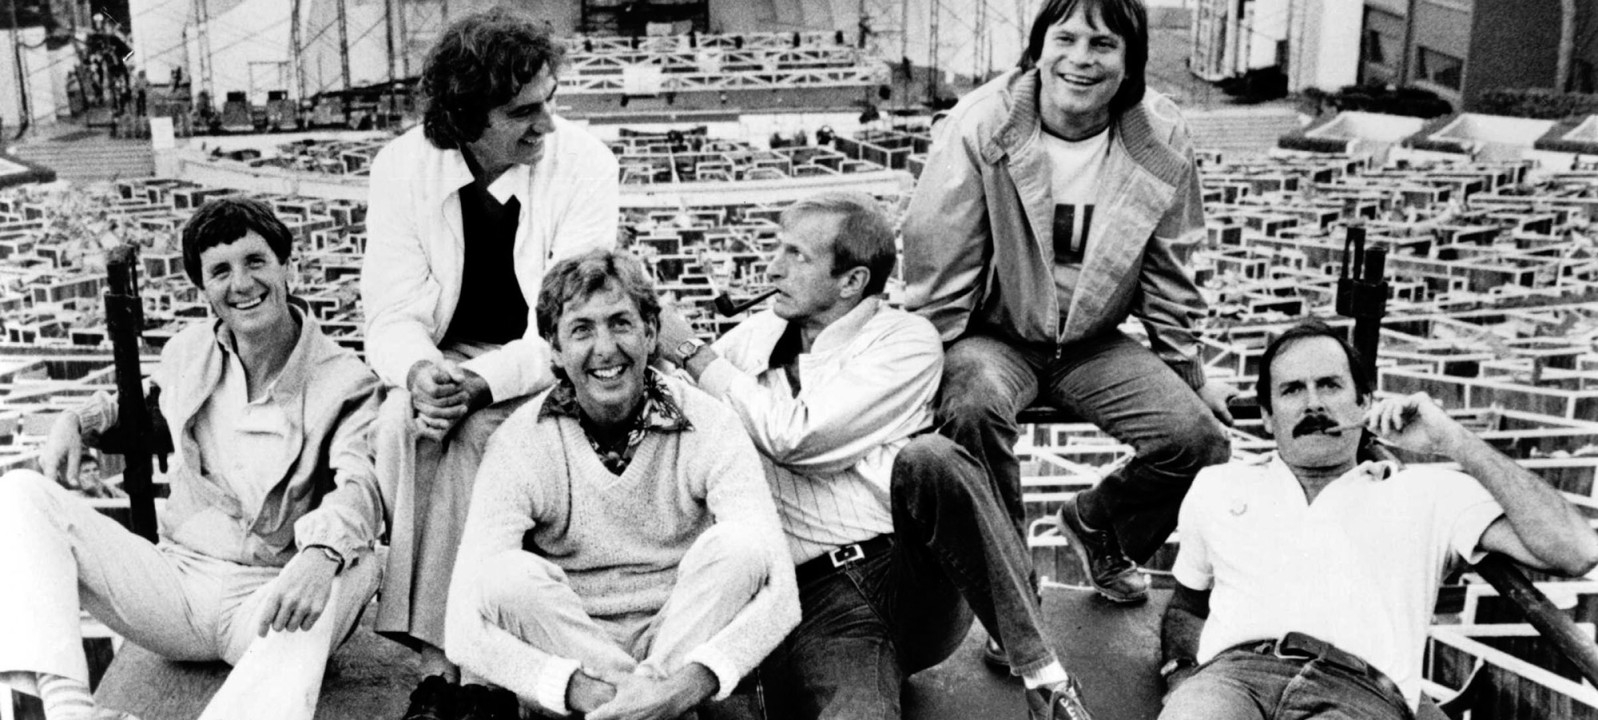 The 'Monty Python' team (L-R: Michael Palin, Terry Jones, Eric Idle, Graham Chapman, Terry Gilliam, John Cleese)